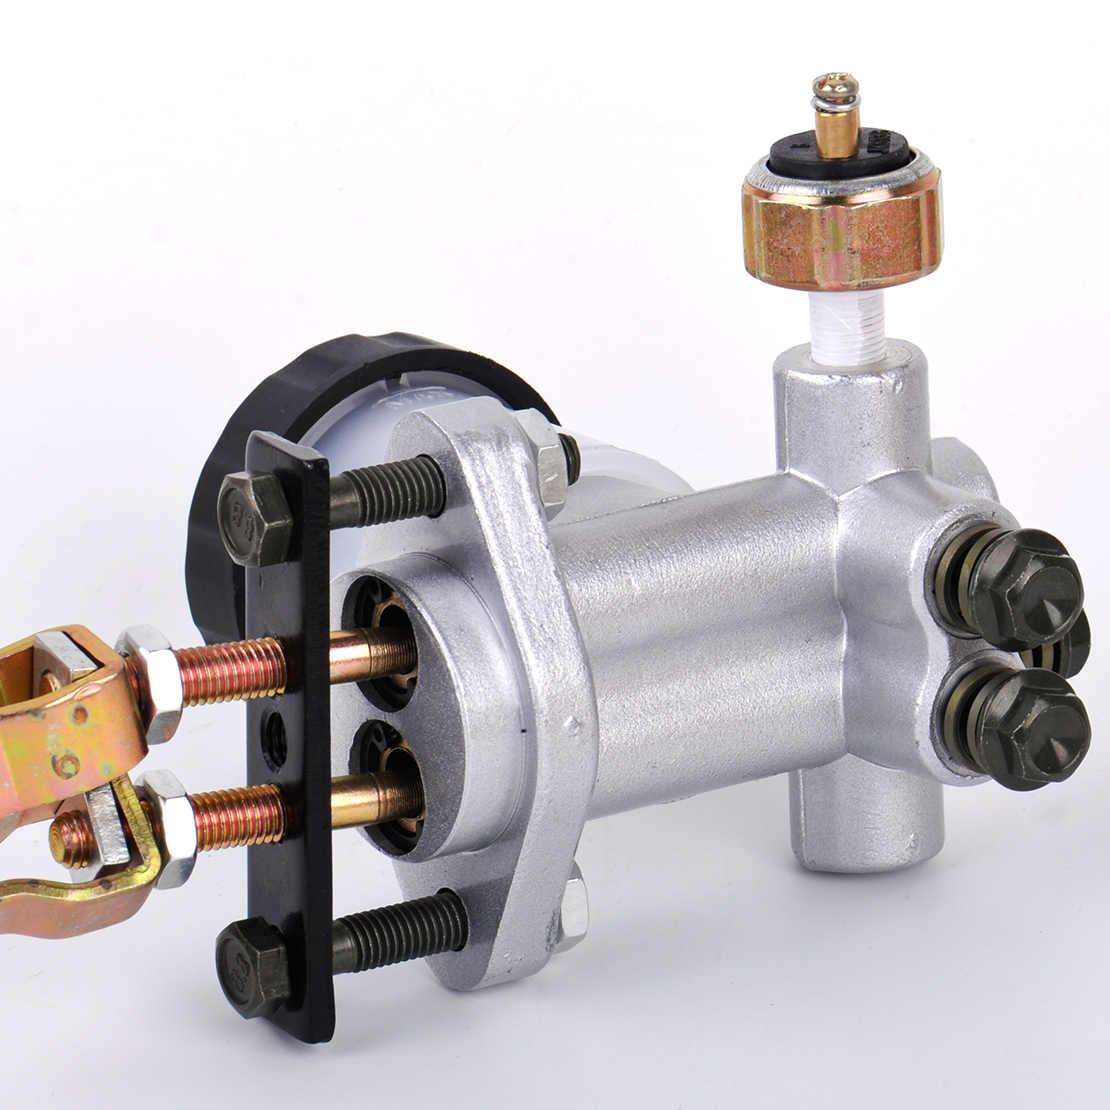 DWCX Hydraulic Brake Master Cylinder fit for 90cc 110cc 125cc 150cc 200cc  250cc Go Kart Dune Buggy Ibosa Twister Carter Talon